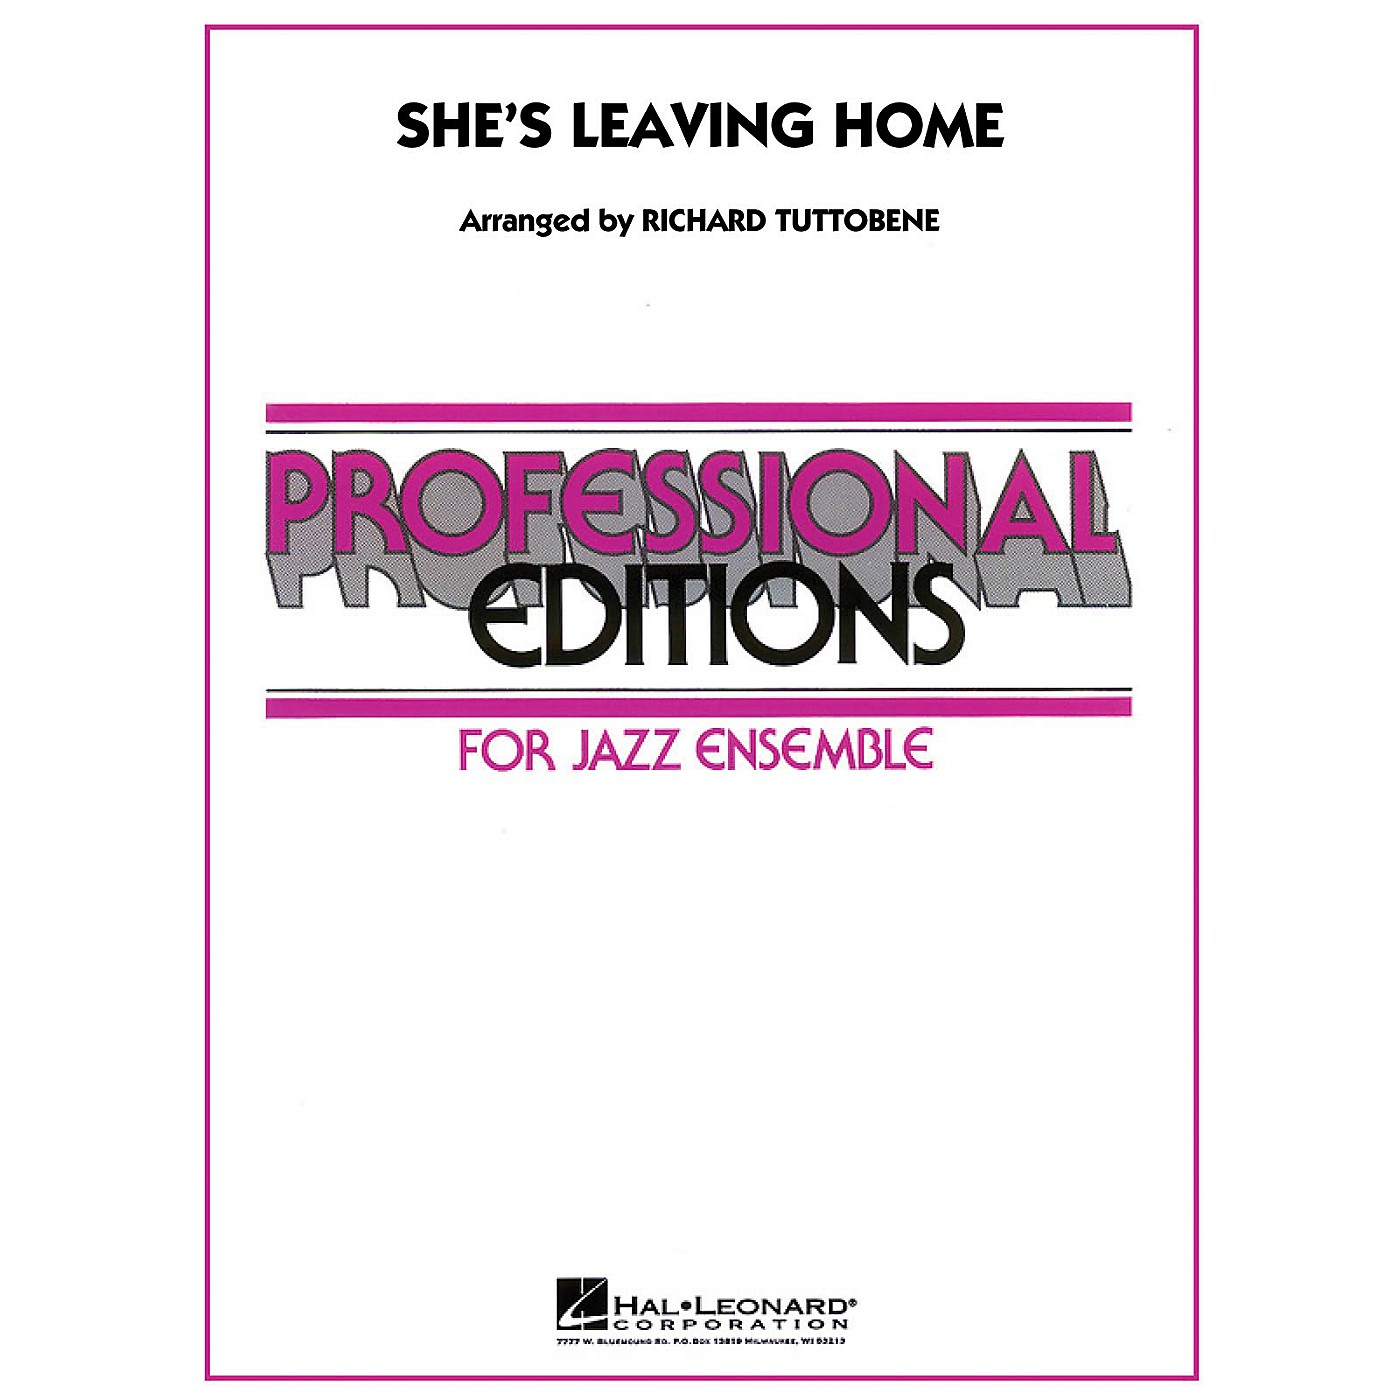 Hal Leonard She's Leaving Home - Professional Editions For Jazz Ensemble Series Level 5 thumbnail